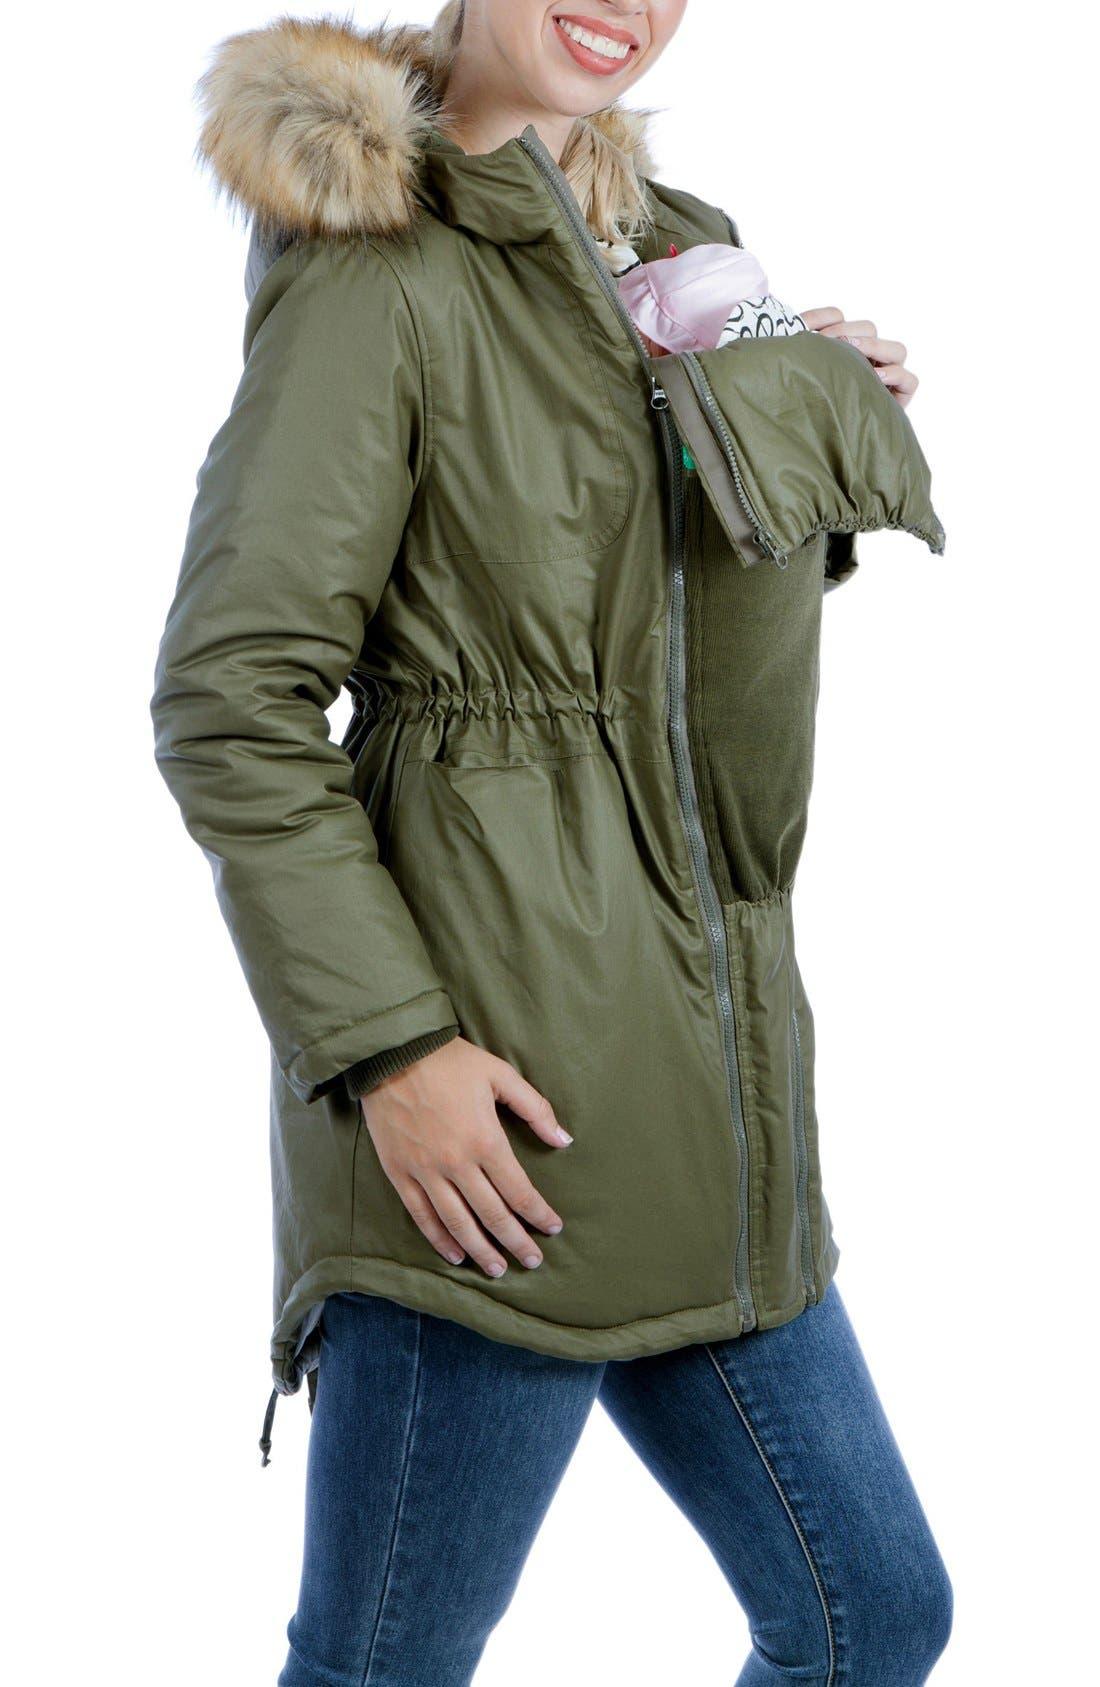 Sofia Waxed 3-in-1 Maternity/Nursing Jacket with Faux Fur Trim,                             Alternate thumbnail 3, color,                             KHAKI GREEN